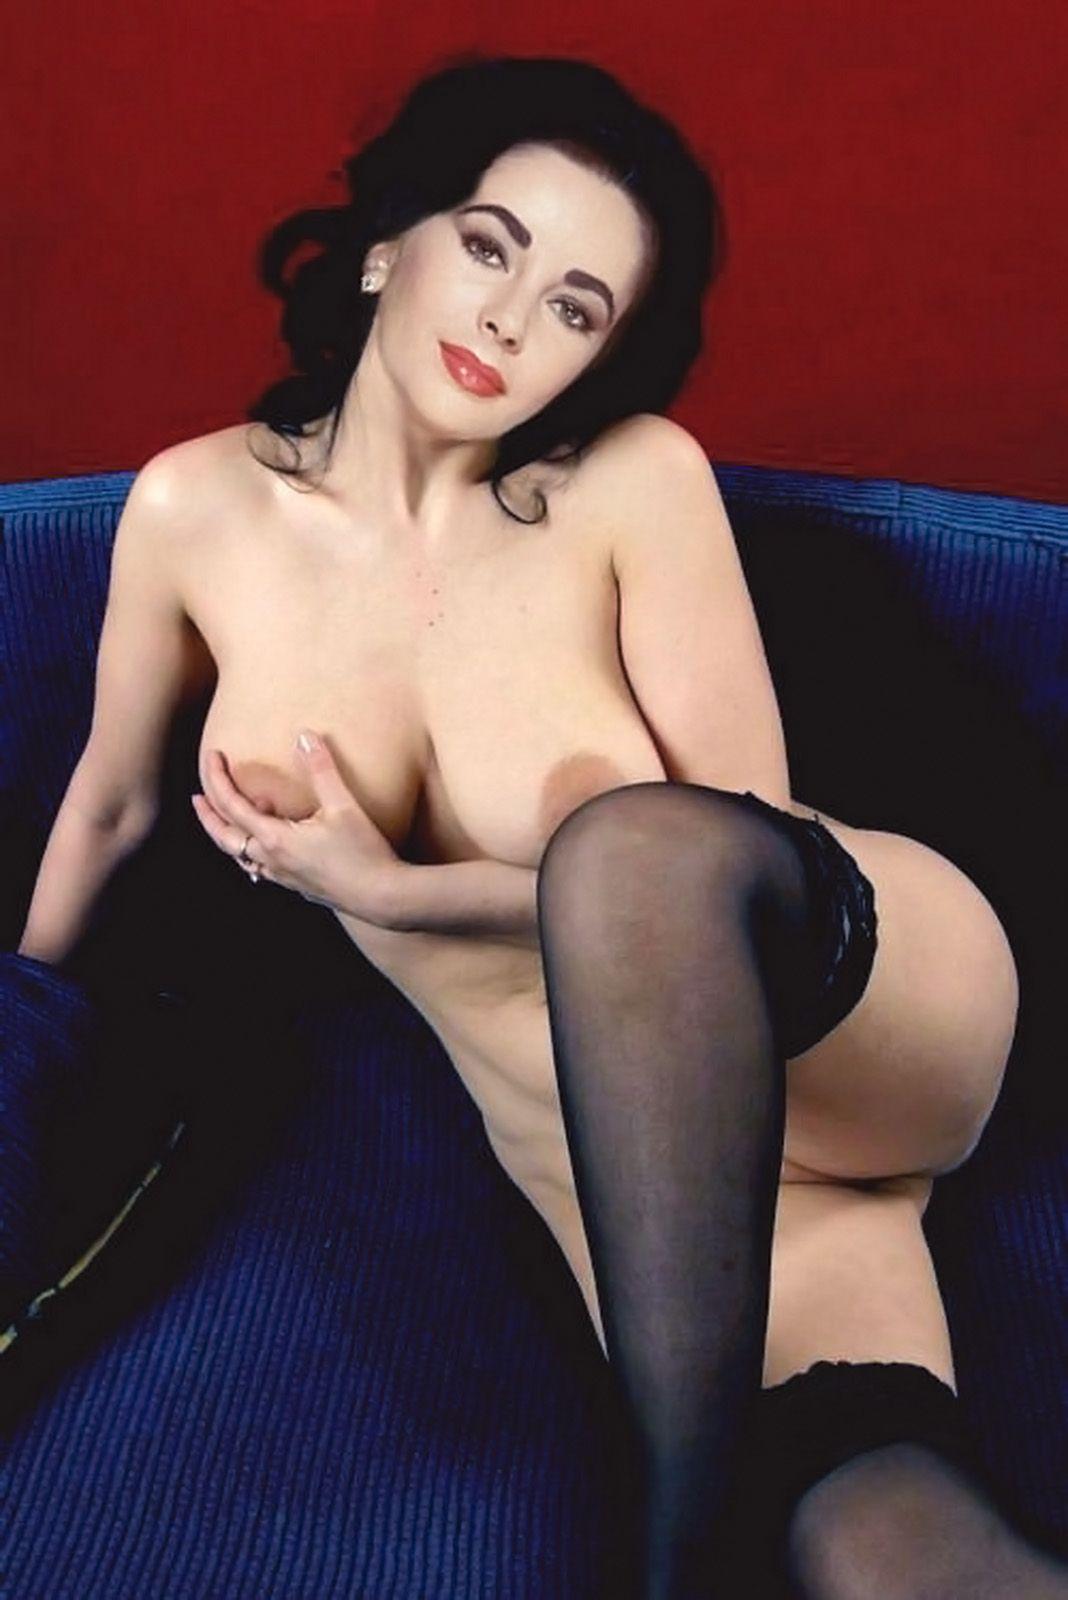 Olivia muns naked ass pics